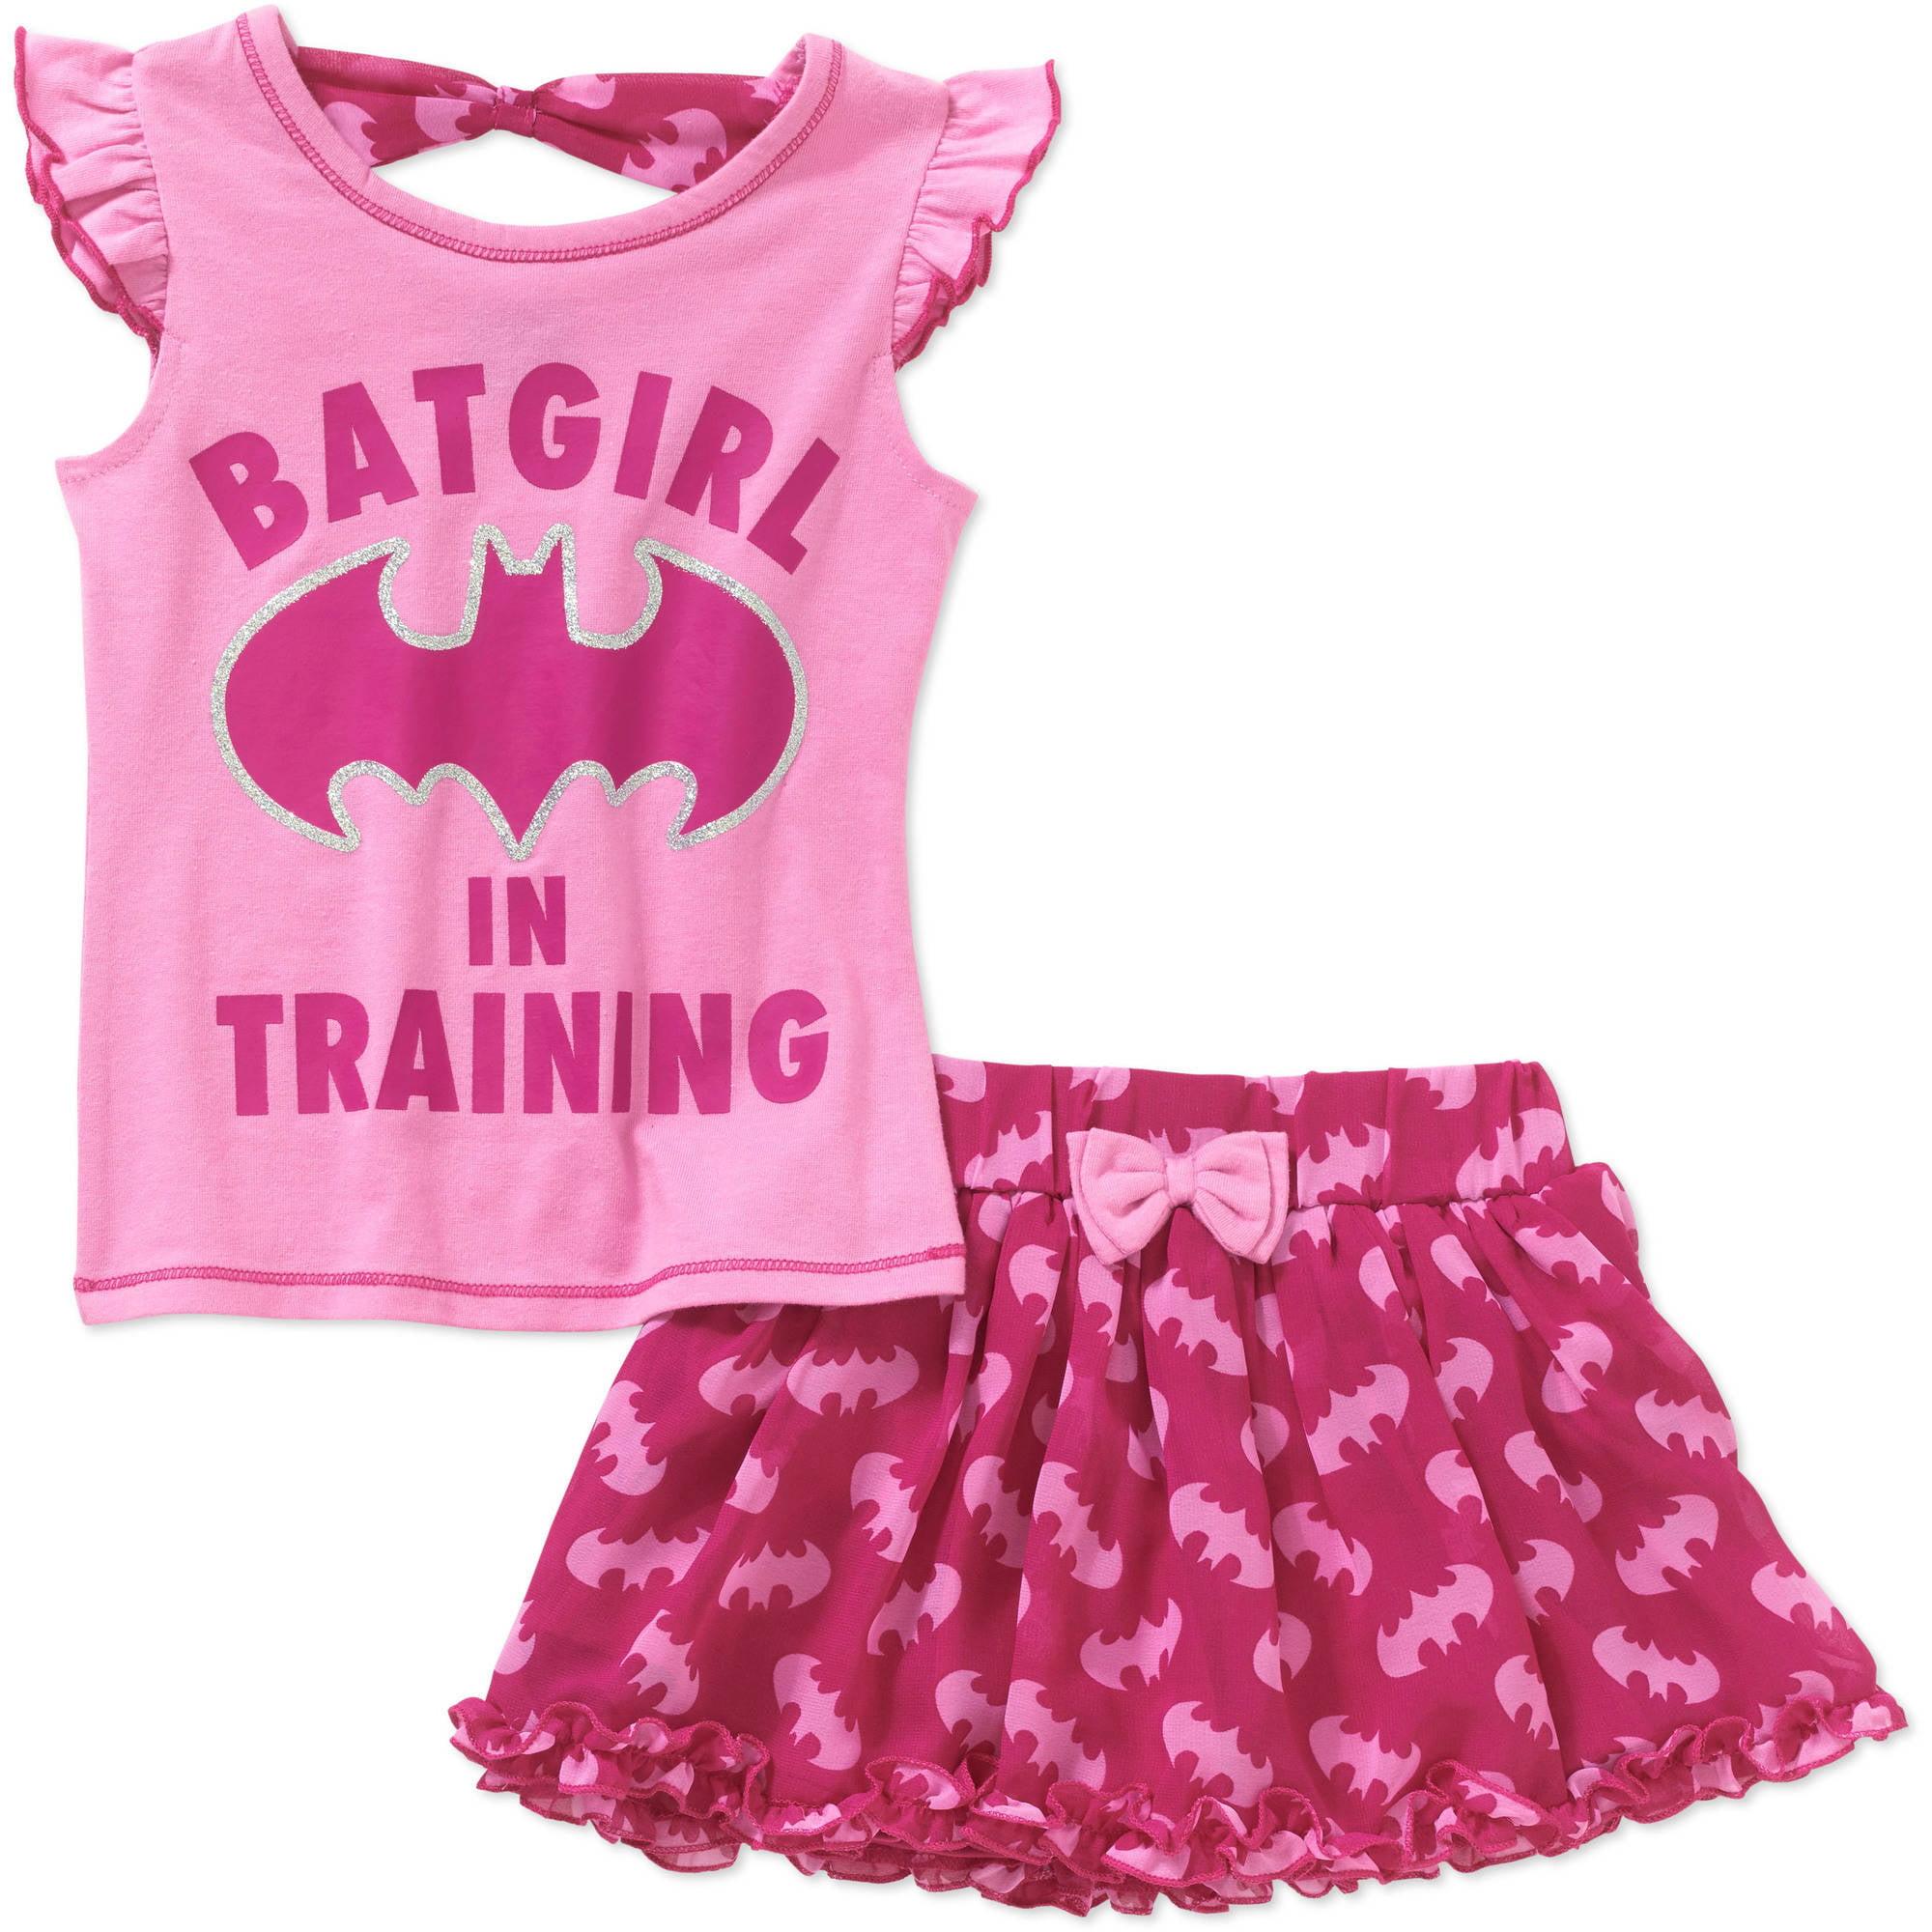 Batgirl Toddler Girls' Tee and Scooter Set